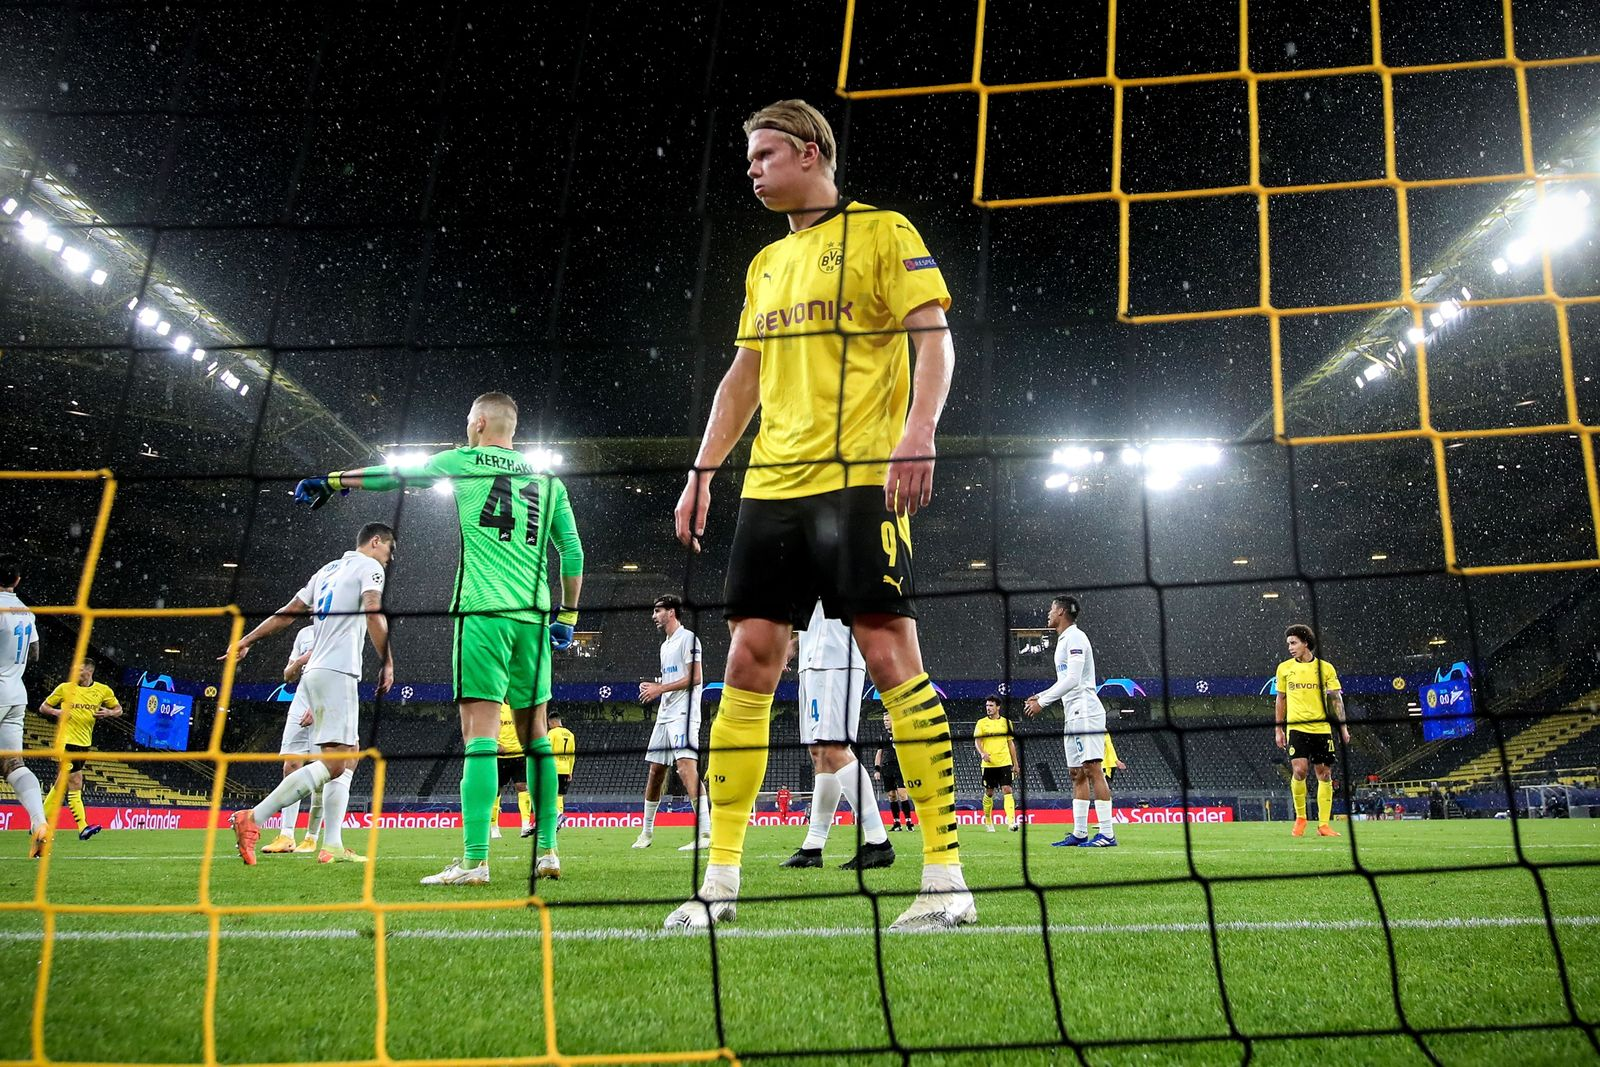 Borussia Dortmund vs Zenit St. Petersburg, Germany - 28 Oct 2020